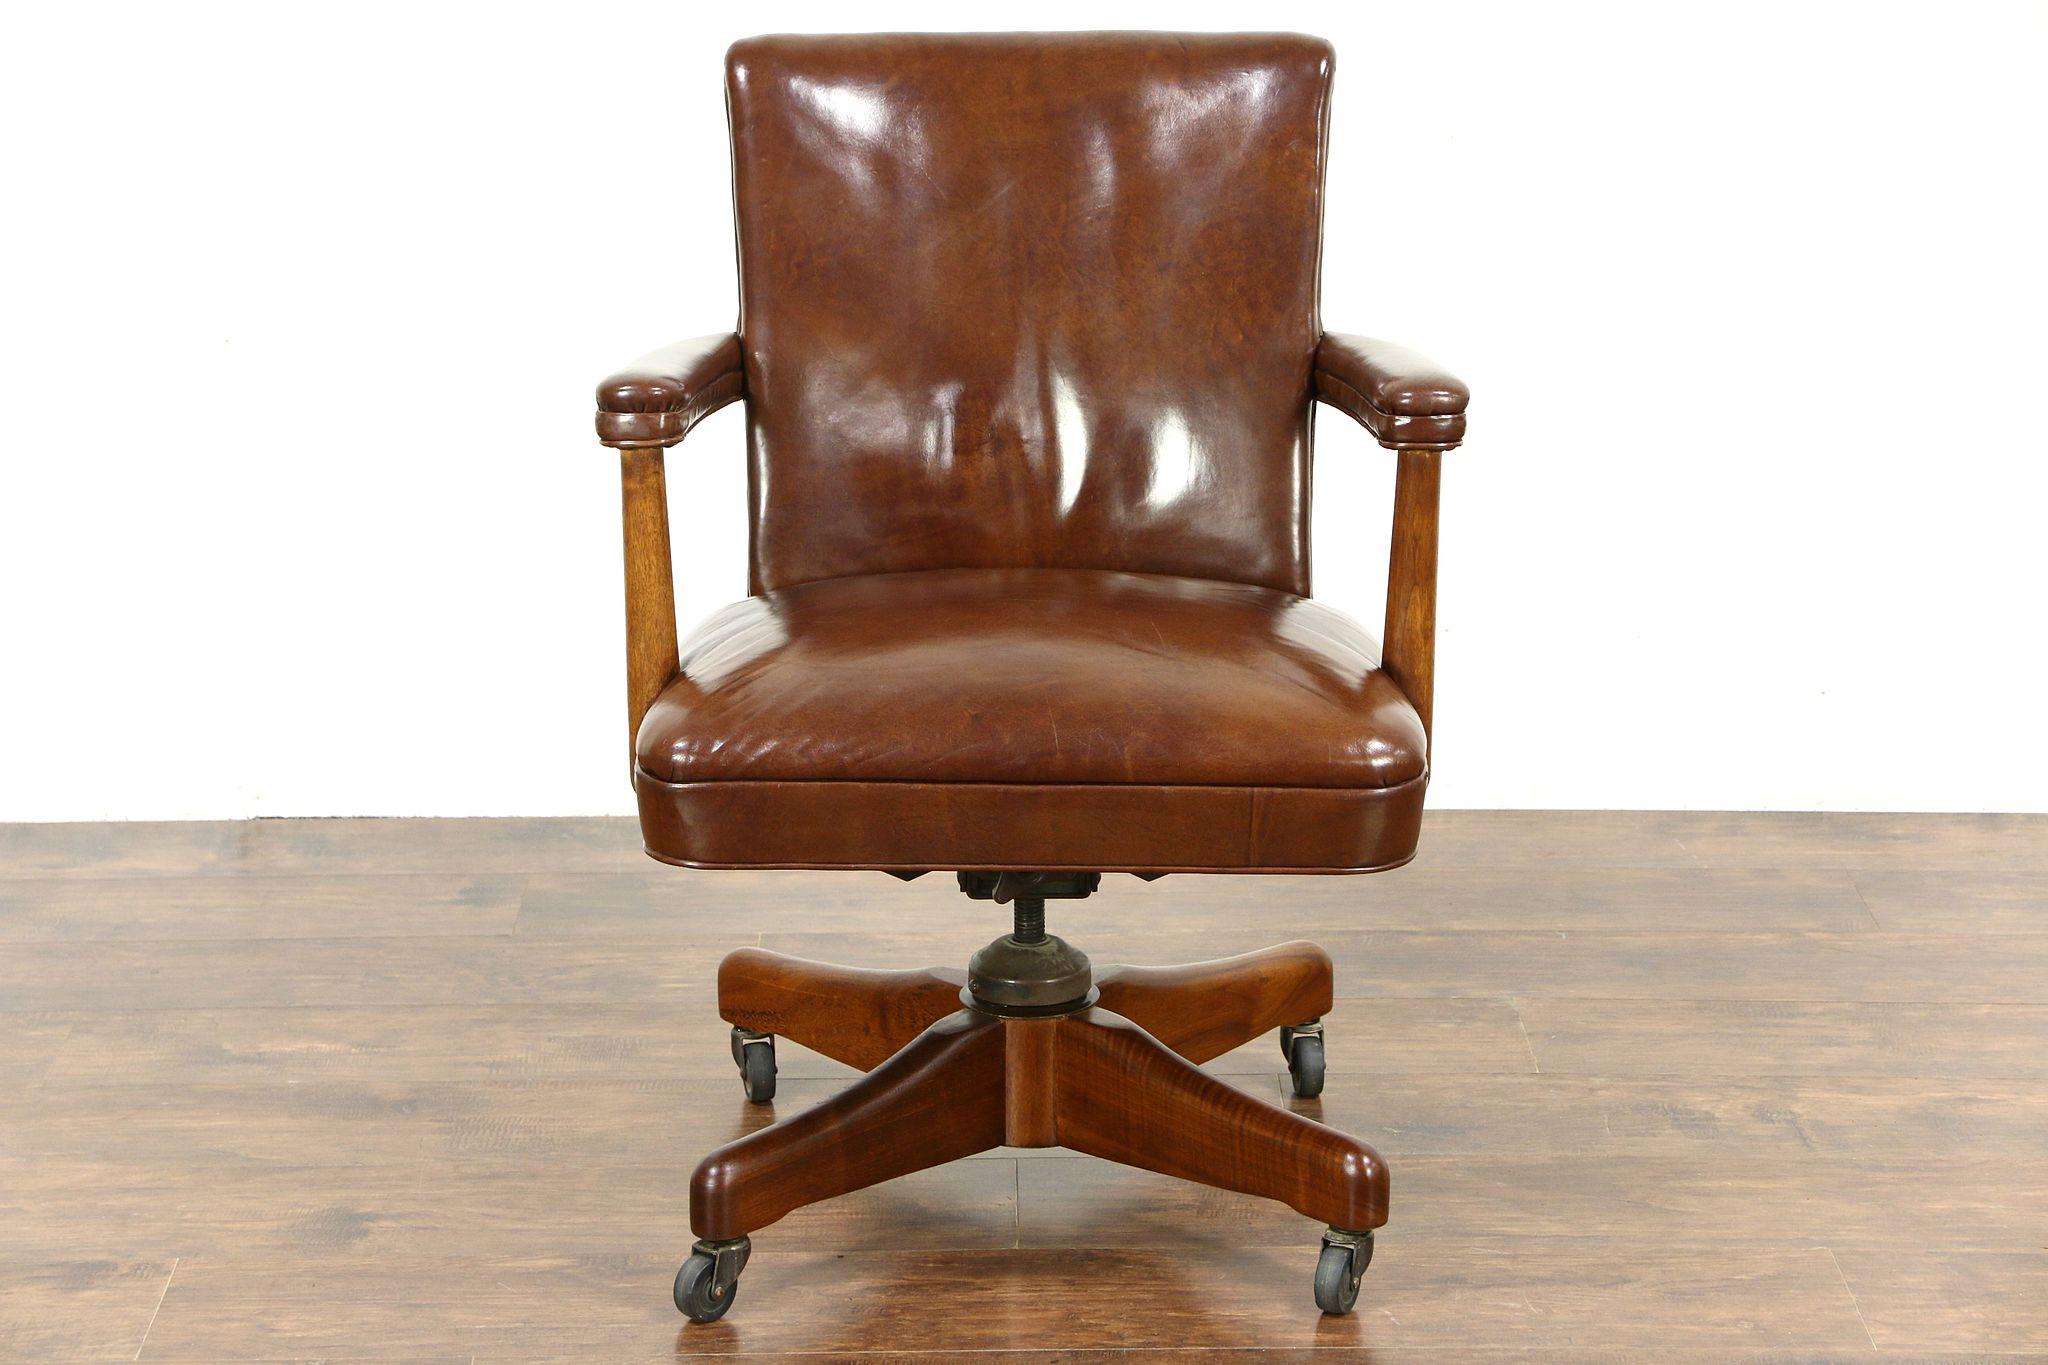 SOLD Midcentury Modern 1960 Vintage Leather Swivel Adjustable